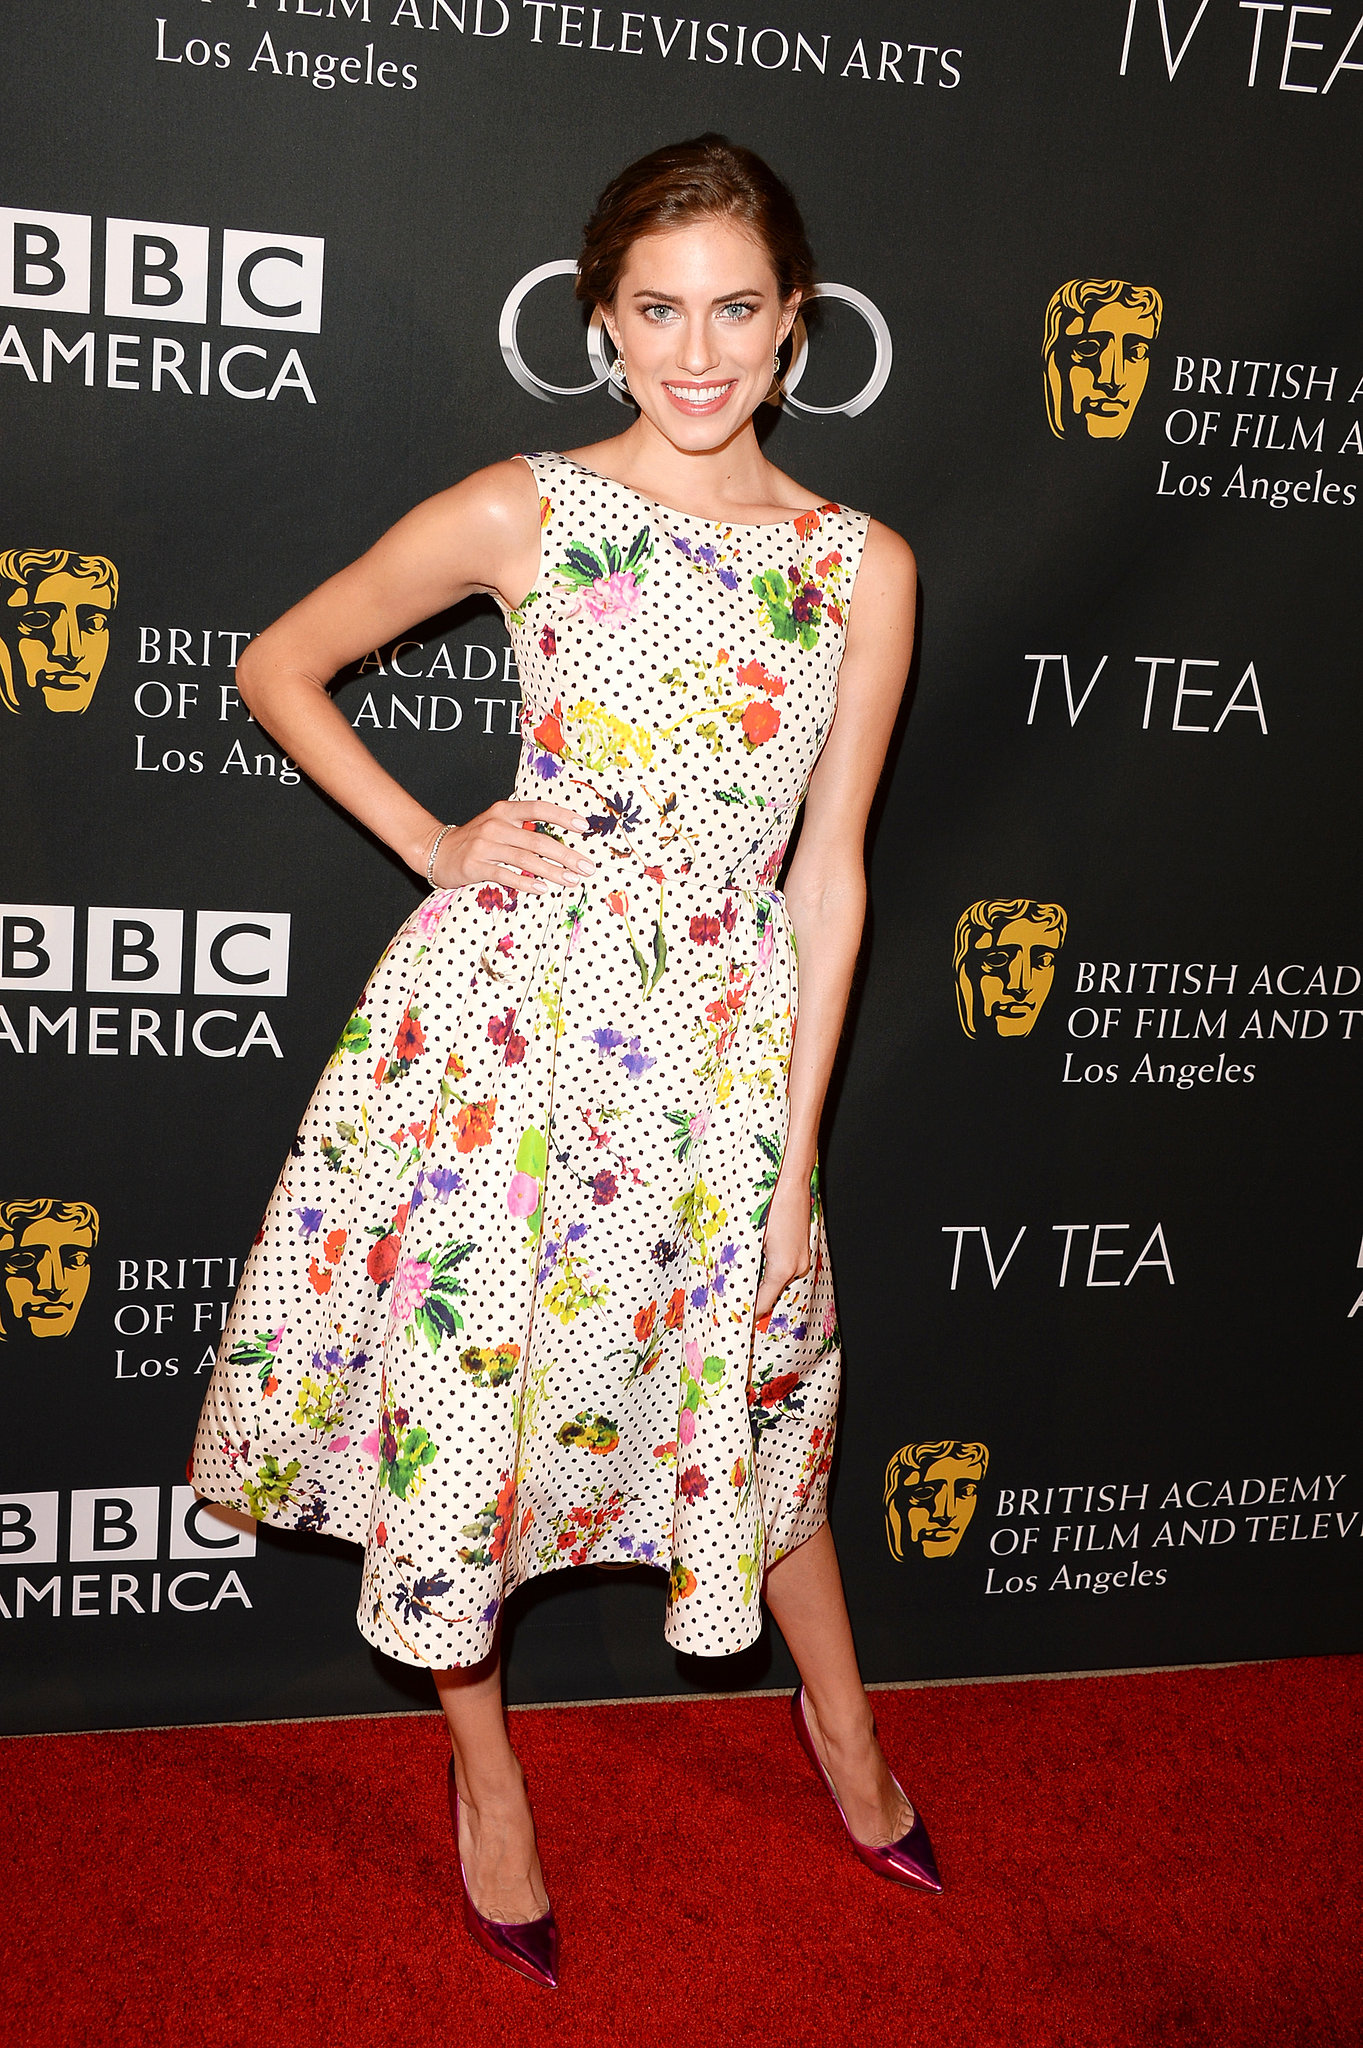 Allison Williams went retro in a floral Oscar de la Renta dress and metallic pumps at the BAFTA LA TV Tea Party.